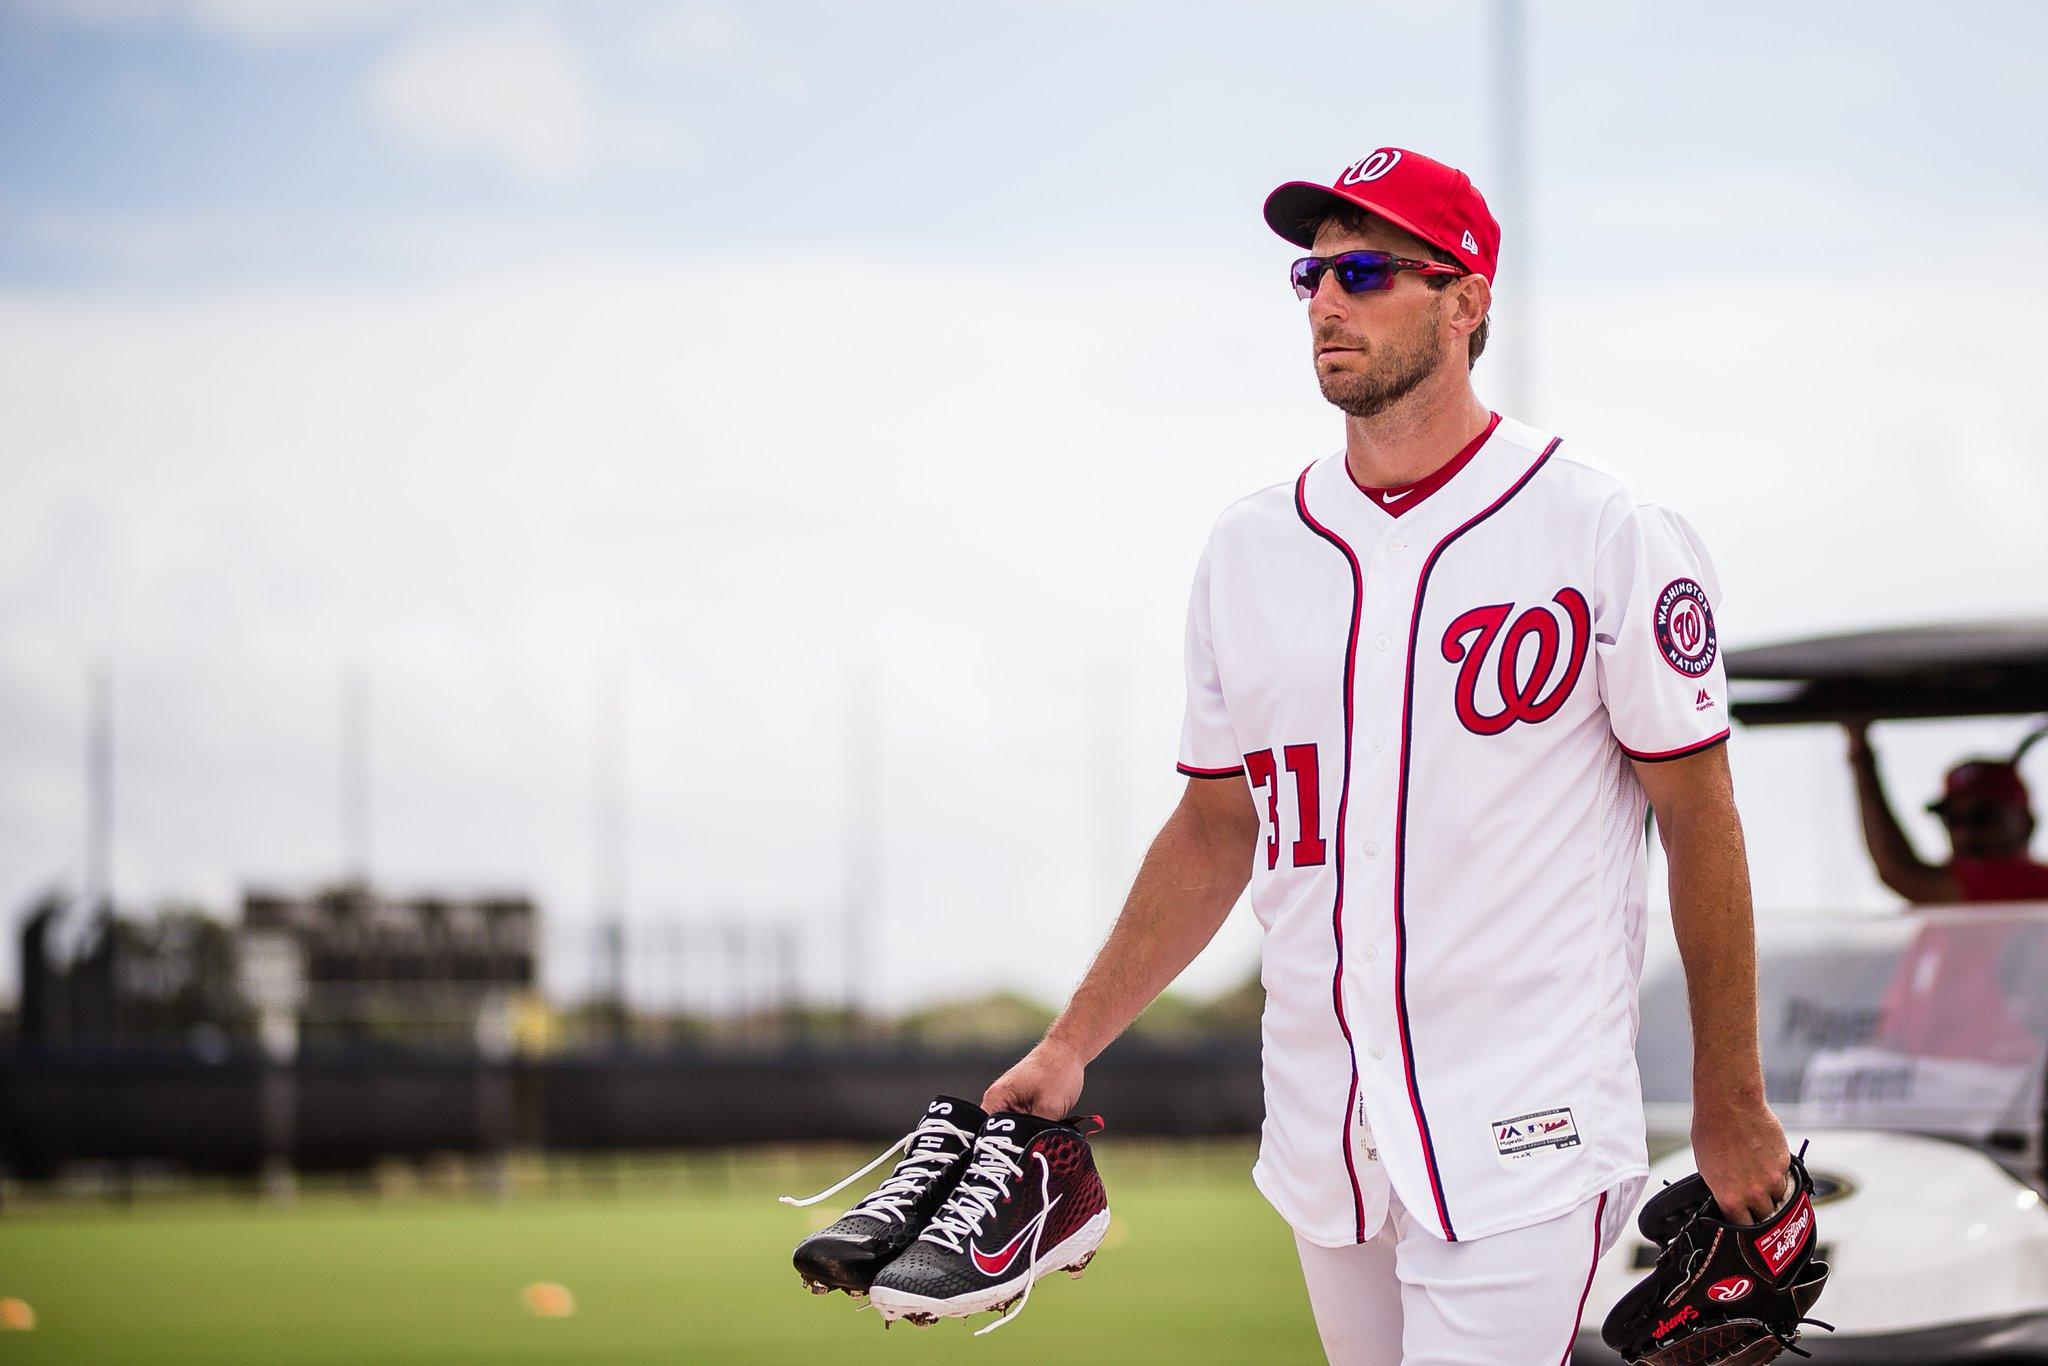 Max Scherzer walking on a baseball field